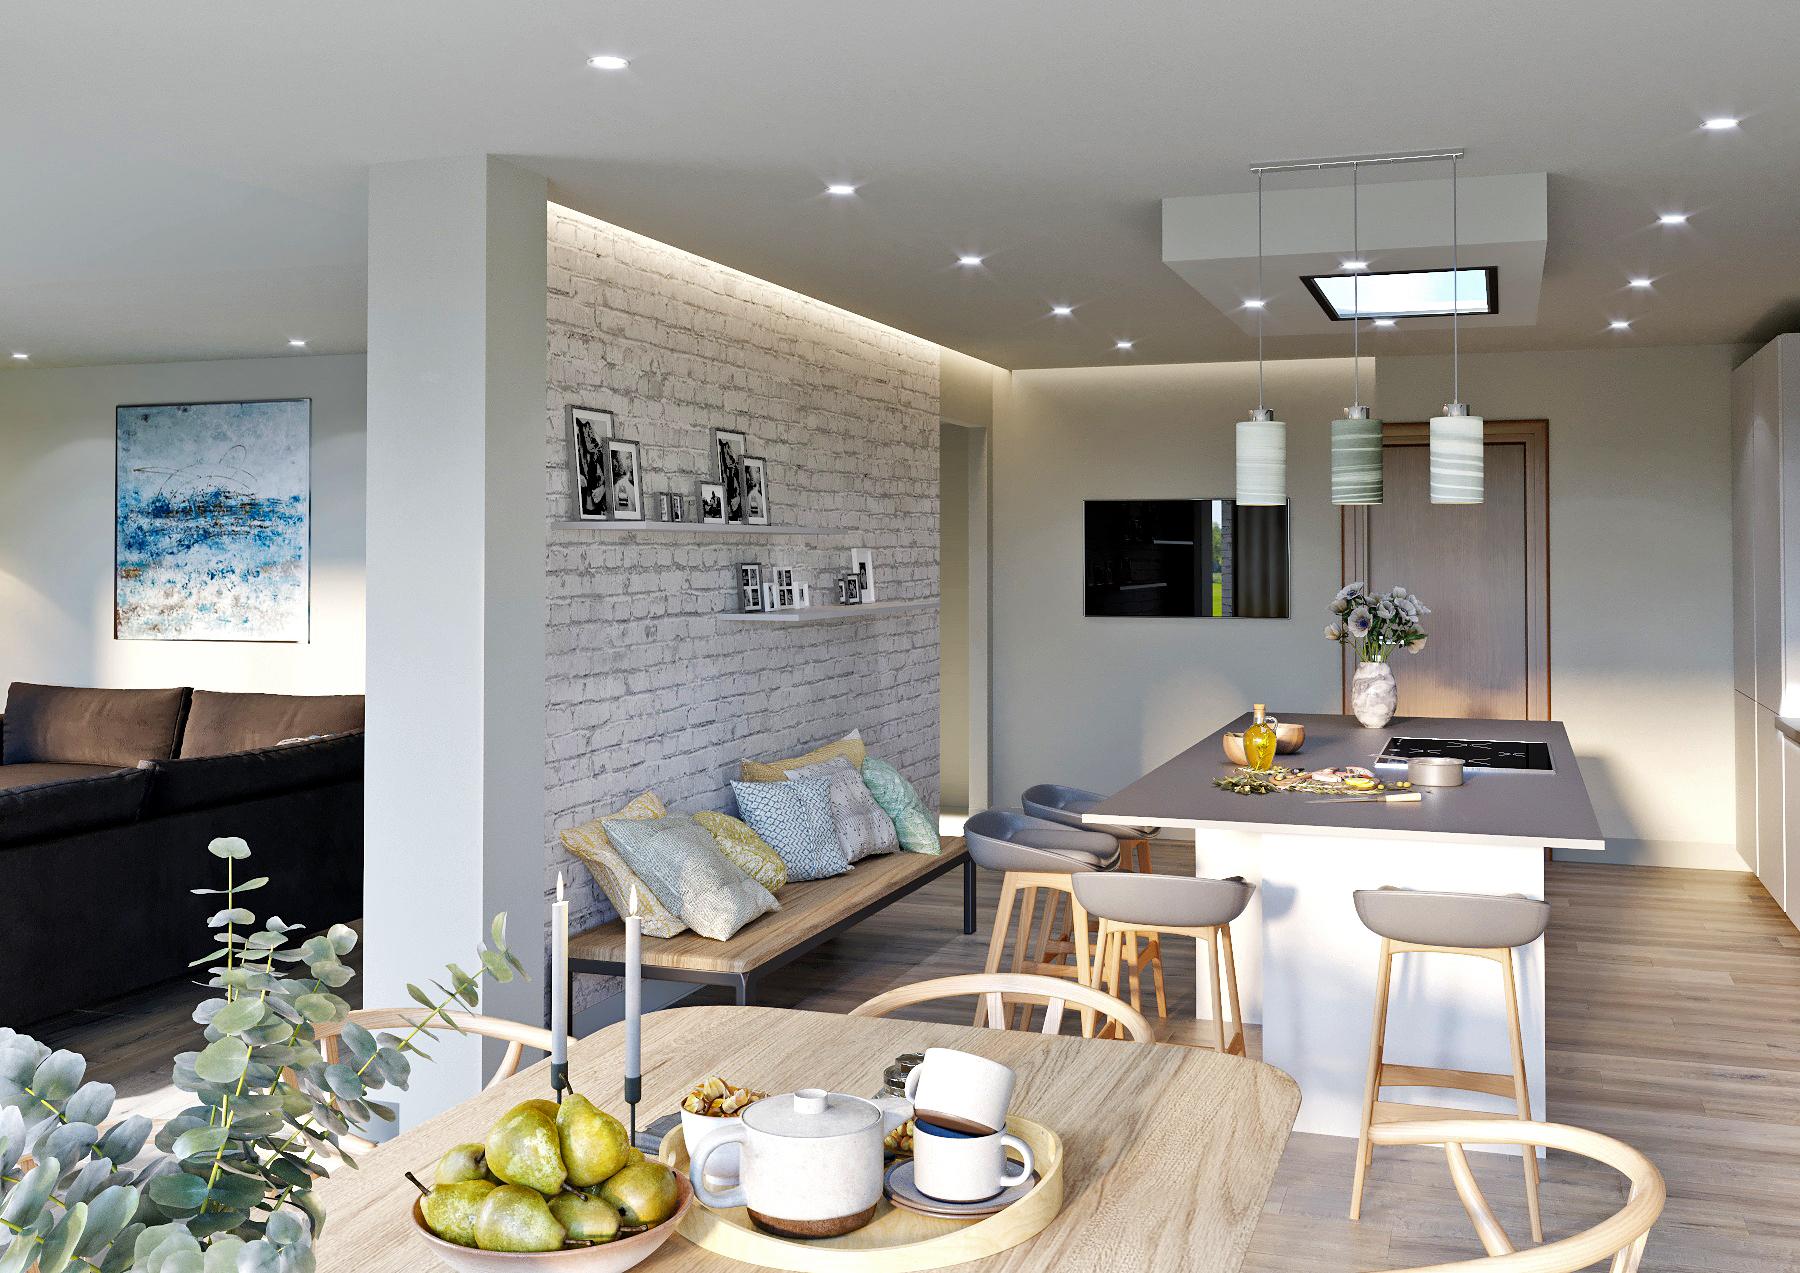 5 Principles of Interior Design: Emphasis